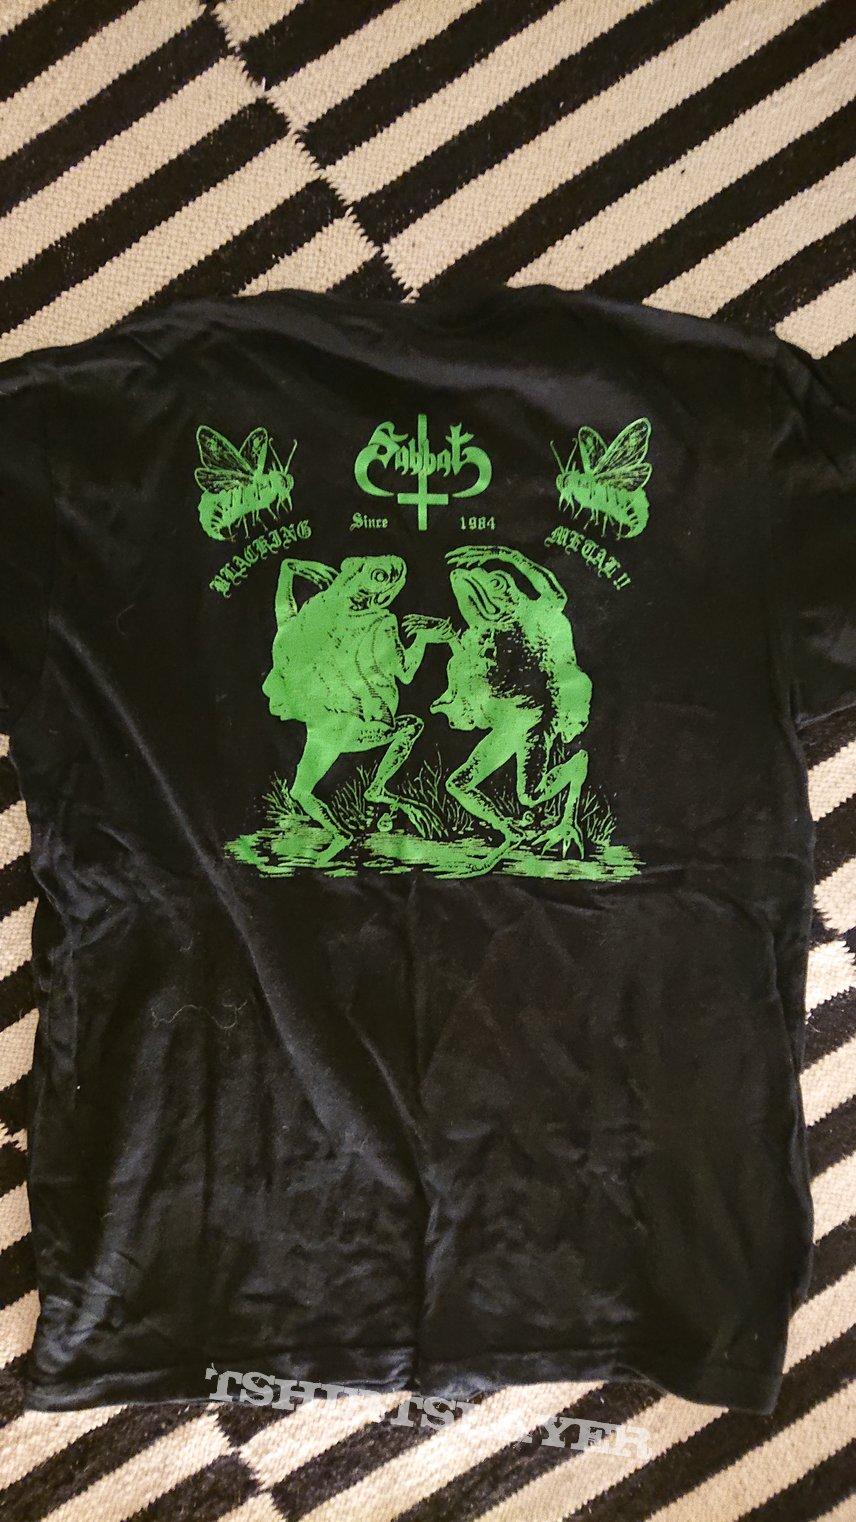 Sabbat - Born by Evil Blood T-shirt